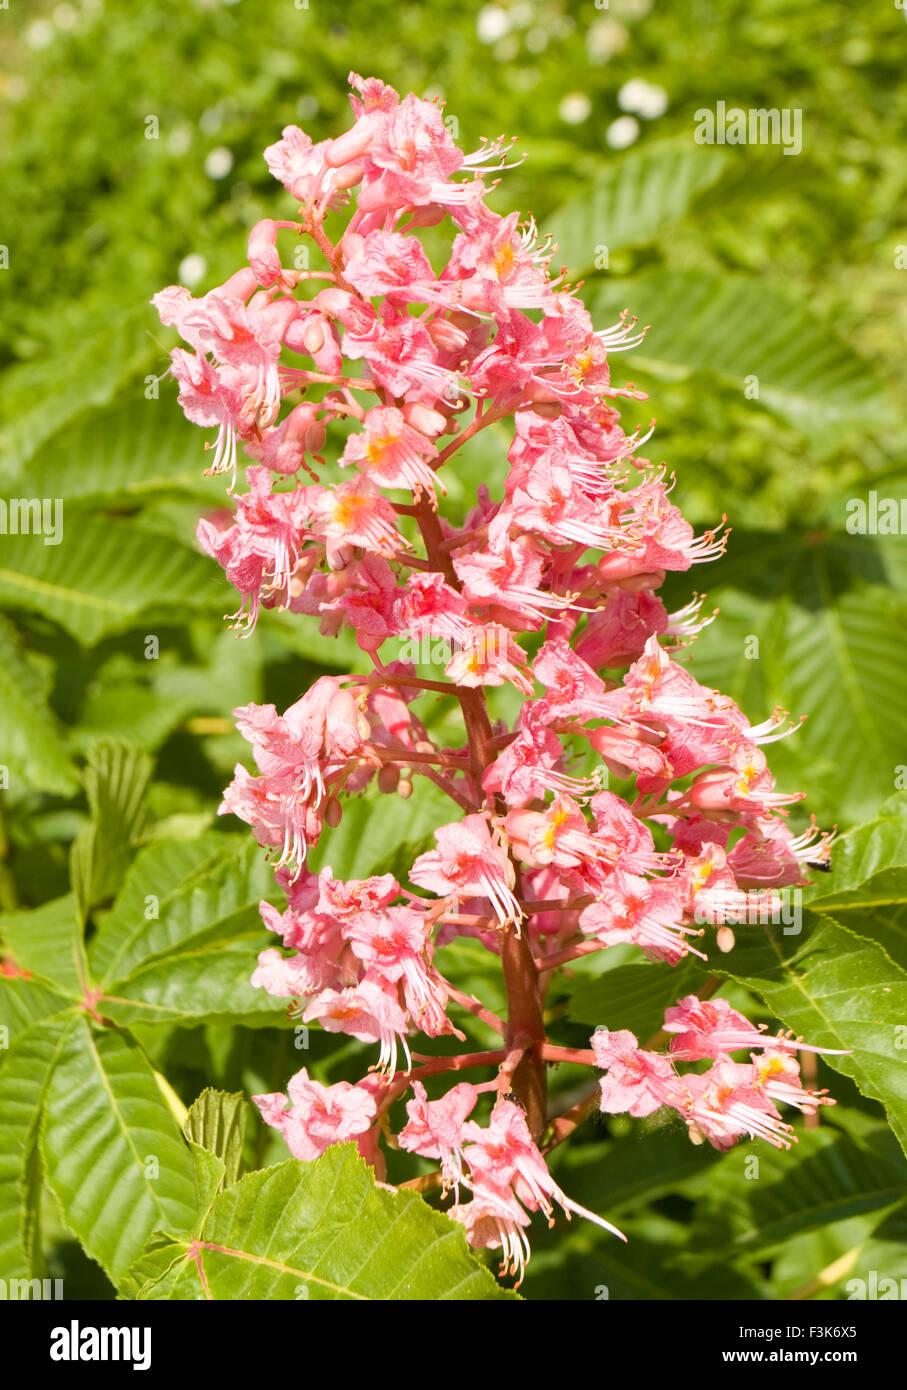 Flower of chestnut tree of pink flower on tree vertical orientation flower of chestnut tree of pink flower on tree vertical orientation mightylinksfo